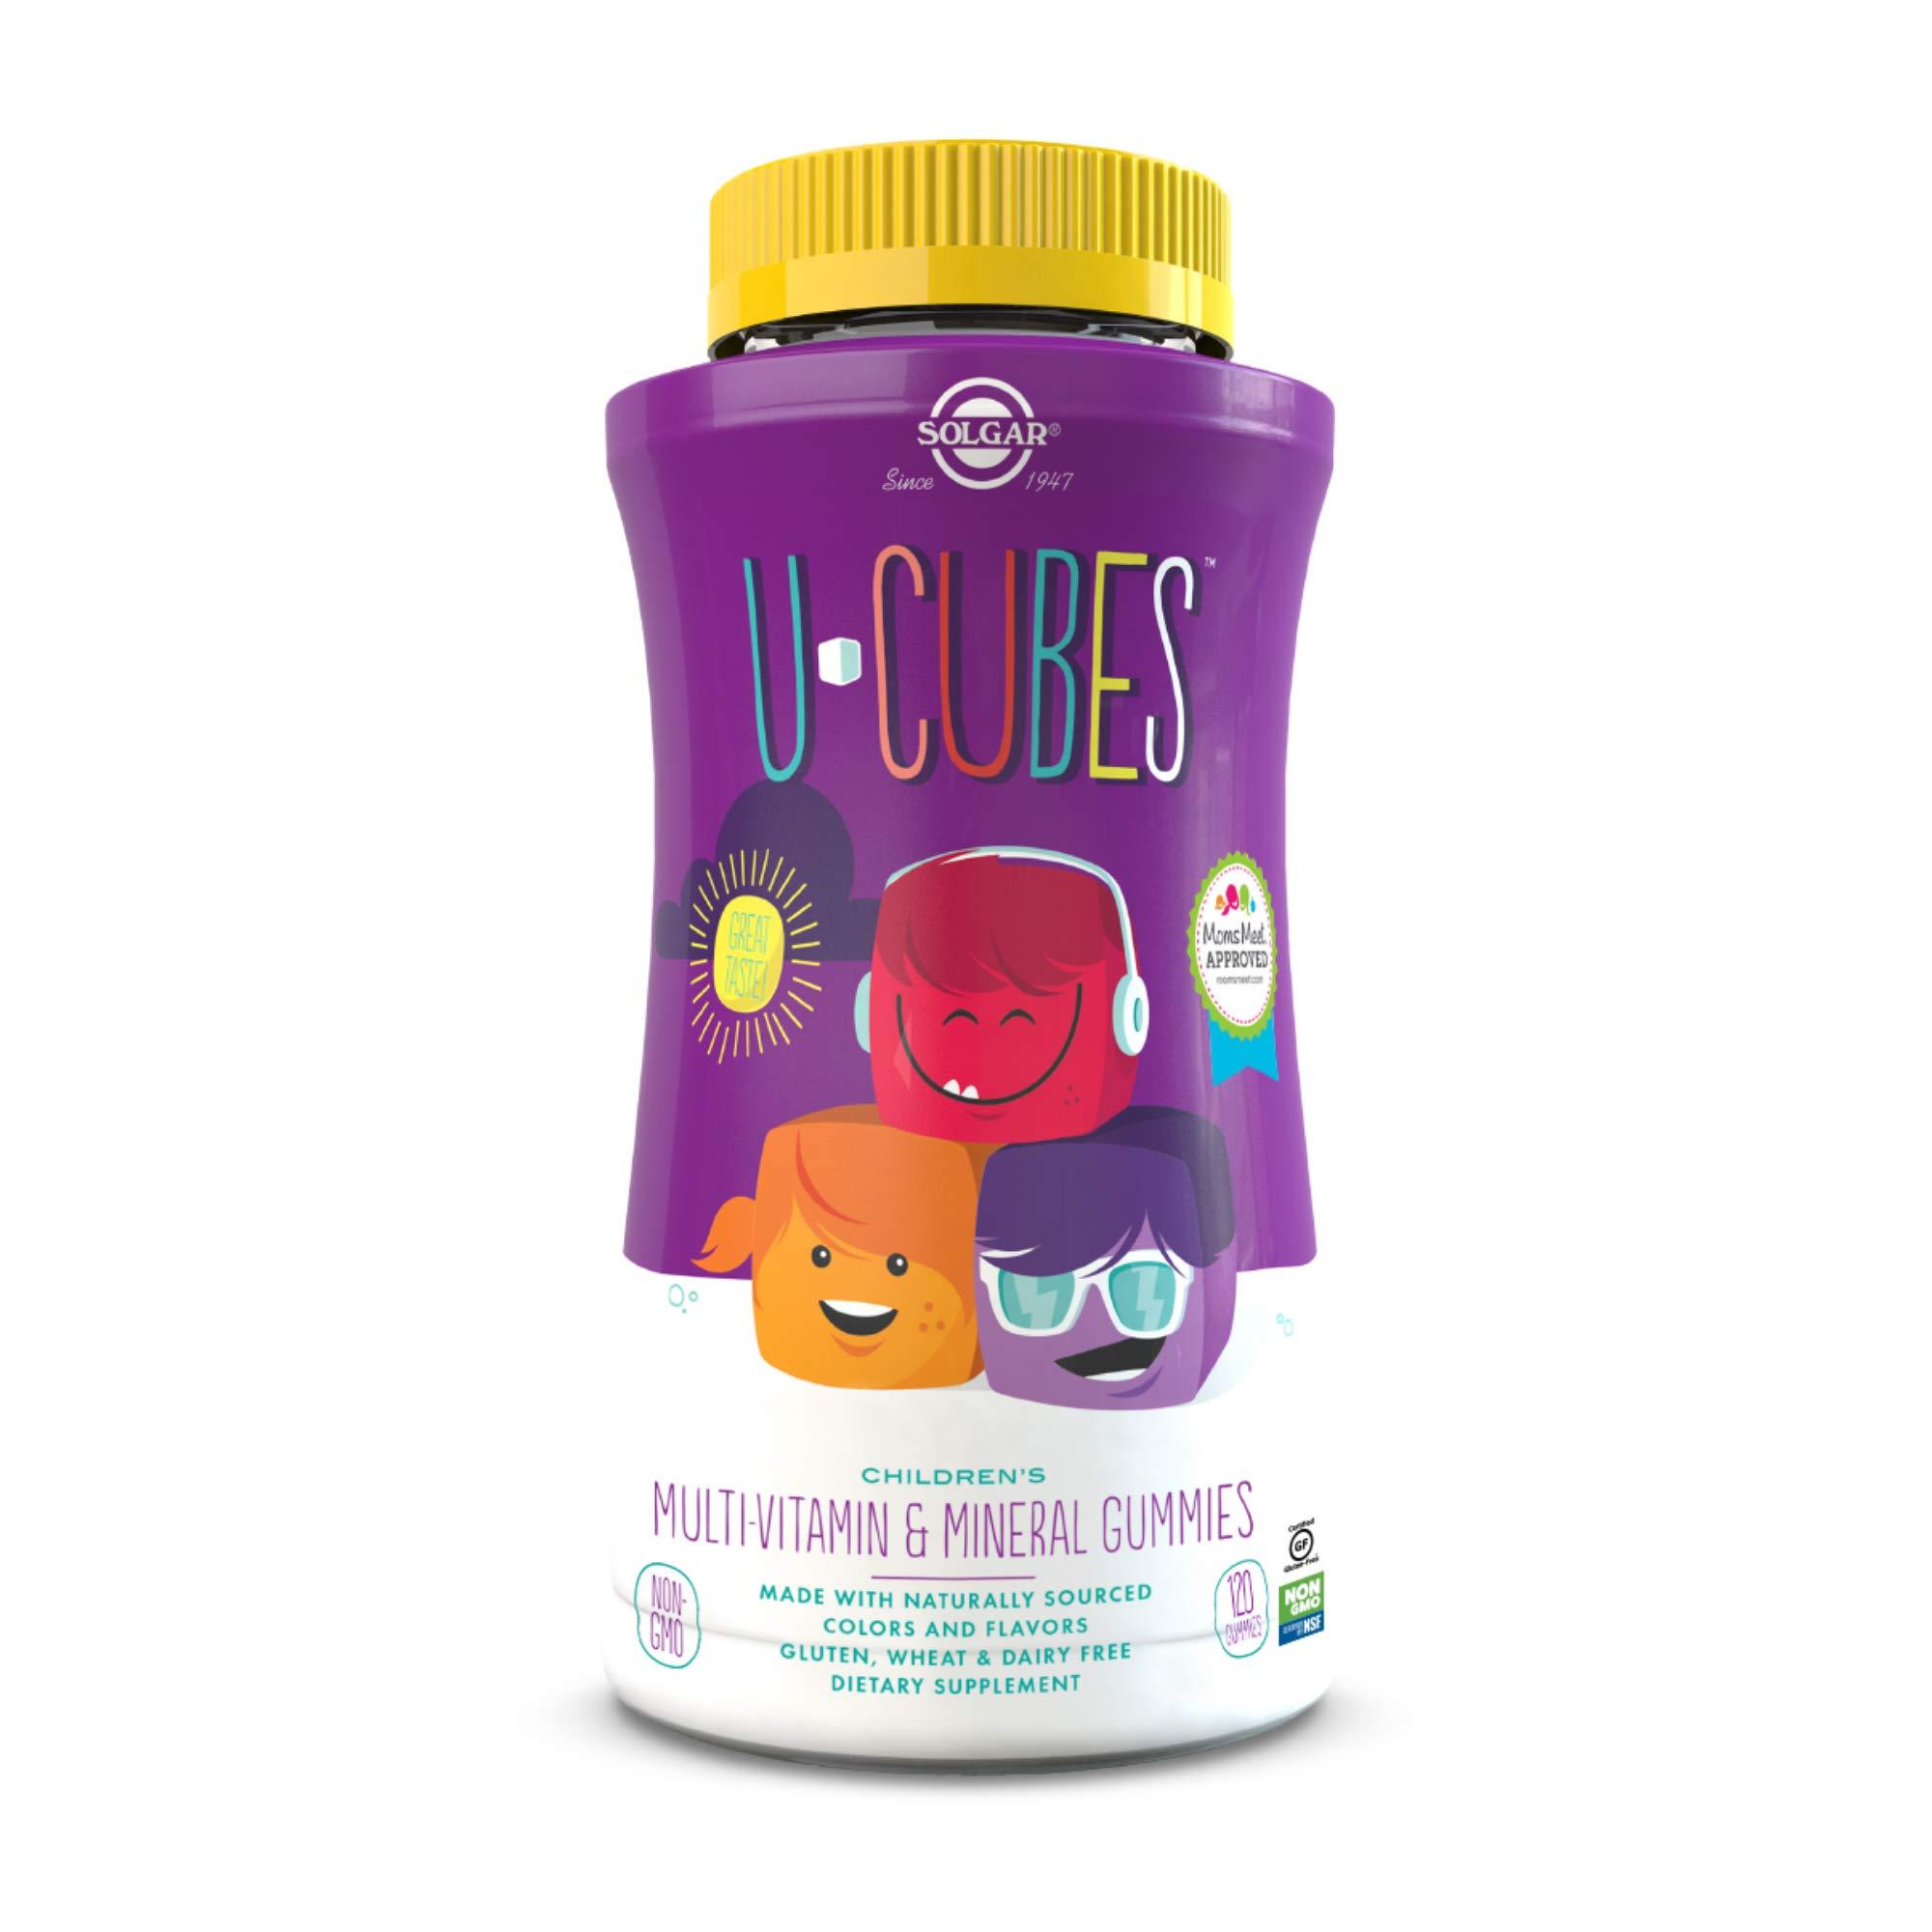 Solgar U-Cubes Children's Multi-Vitamin & Minerals , 120 Gummies - 3 Great-Tasting Flavors , Grape , Orange & Cherry - Ages 2 & Up - Non GMO , Gluten Free , Dairy Free - 60 Servings